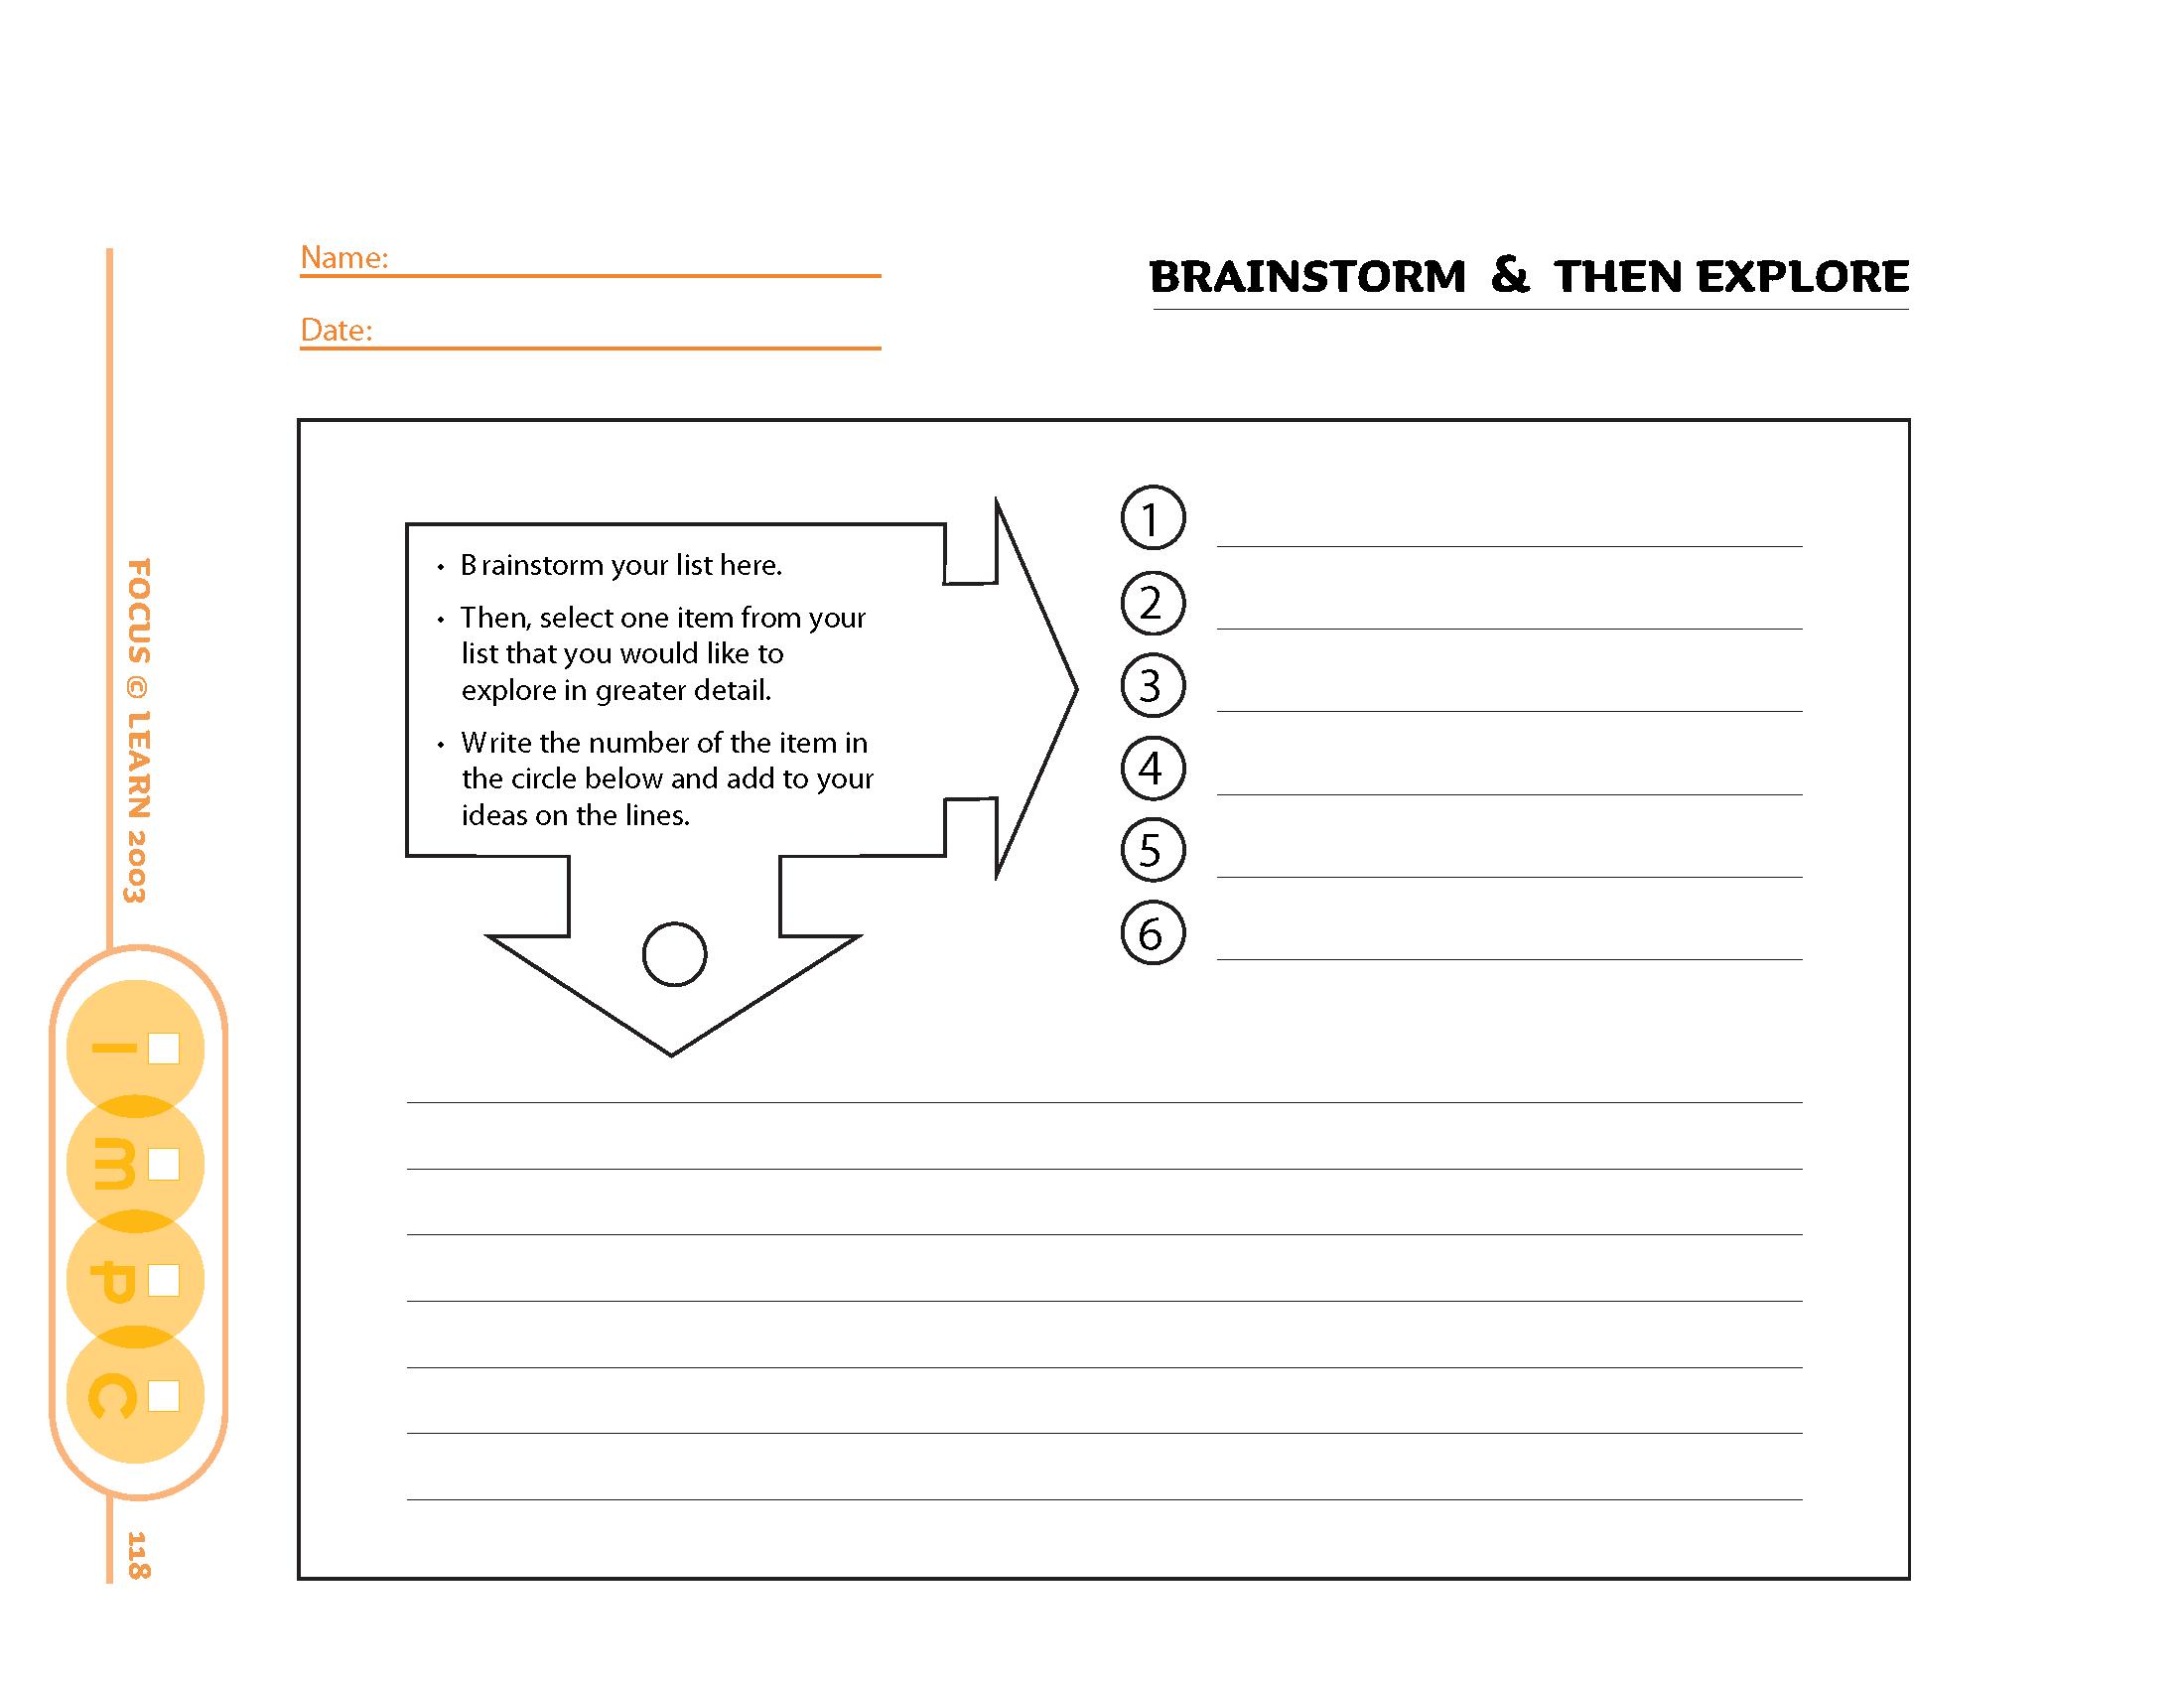 Brainstorm and Then Explore